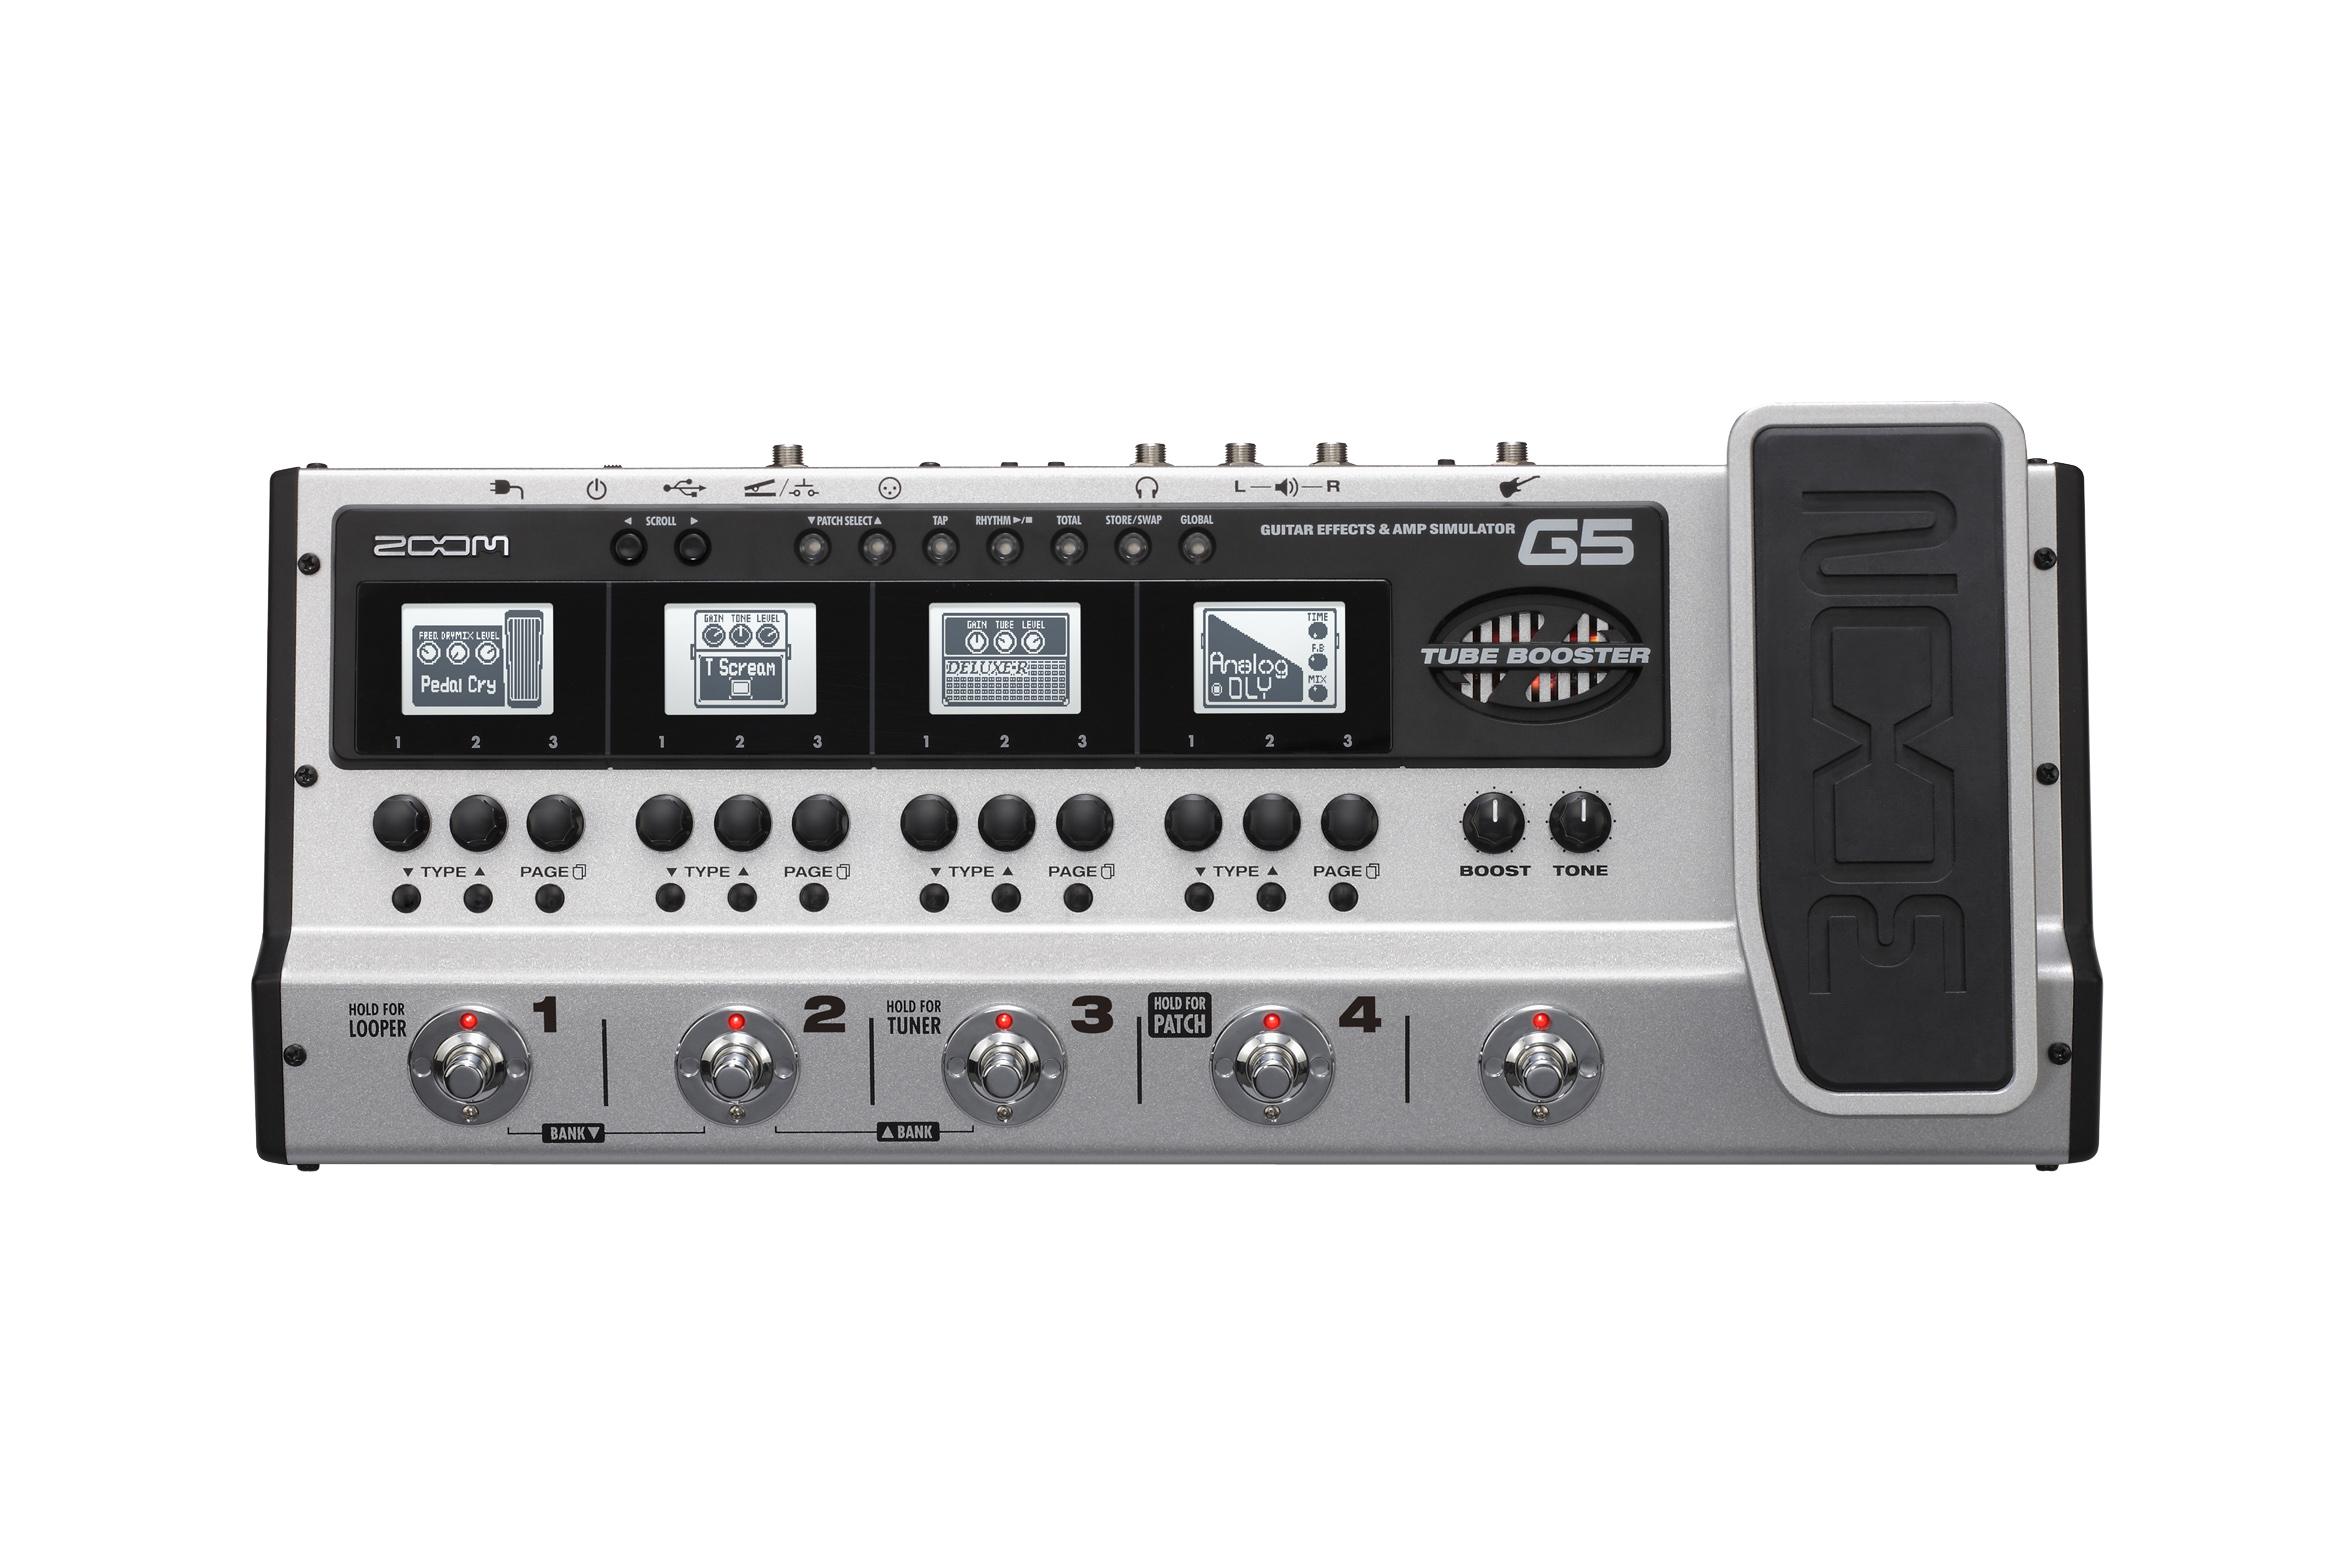 zoom g5 guitar effects amp simulator pedal. Black Bedroom Furniture Sets. Home Design Ideas